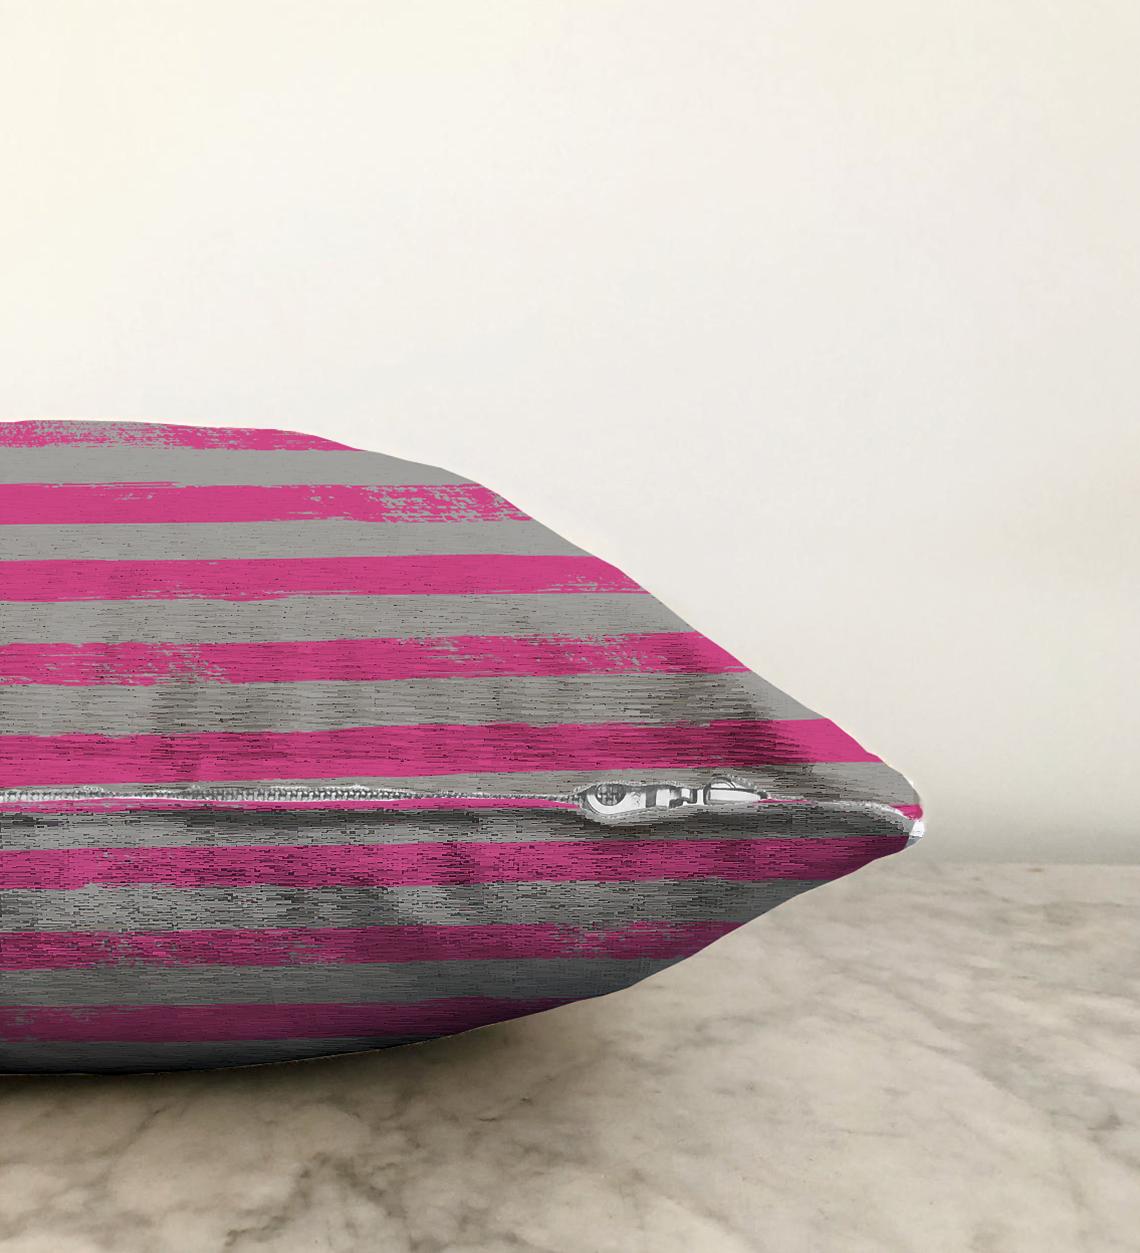 Çizgi Kolaj Motifli Çift Taraflı Dekoratif Modern Şönil Yastık Kılıfı - 55 x 55 cm Realhomes